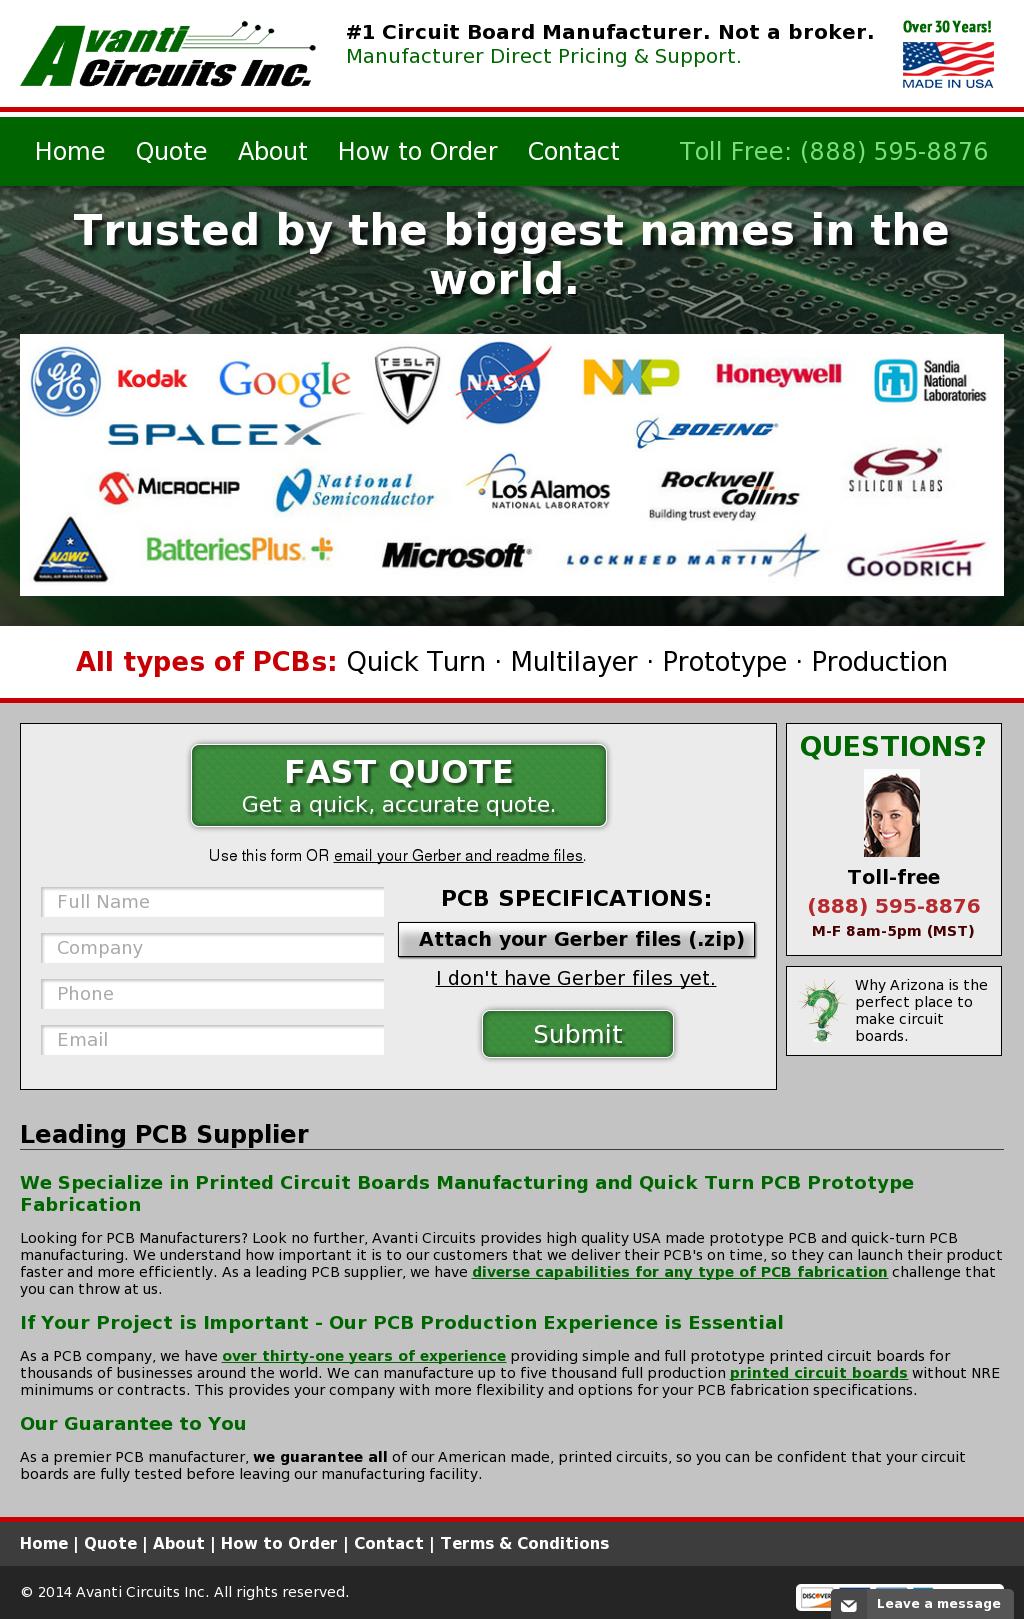 Avanti Circuits Competitors, Revenue and Employees - Owler Company ...